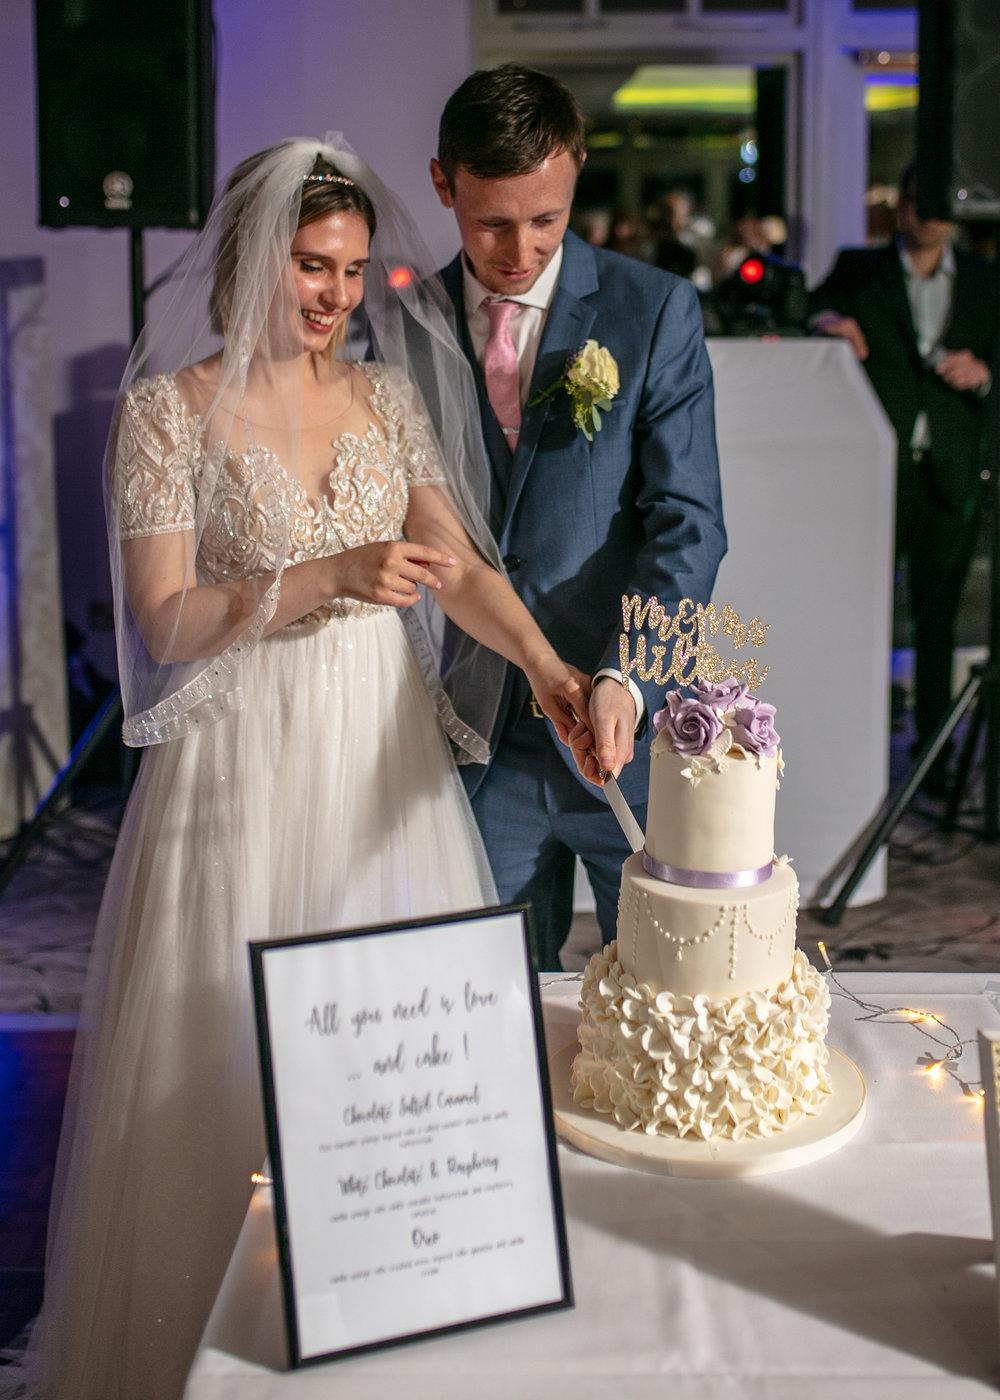 Charringworth-Manor-Wedding-Photography48.jpg